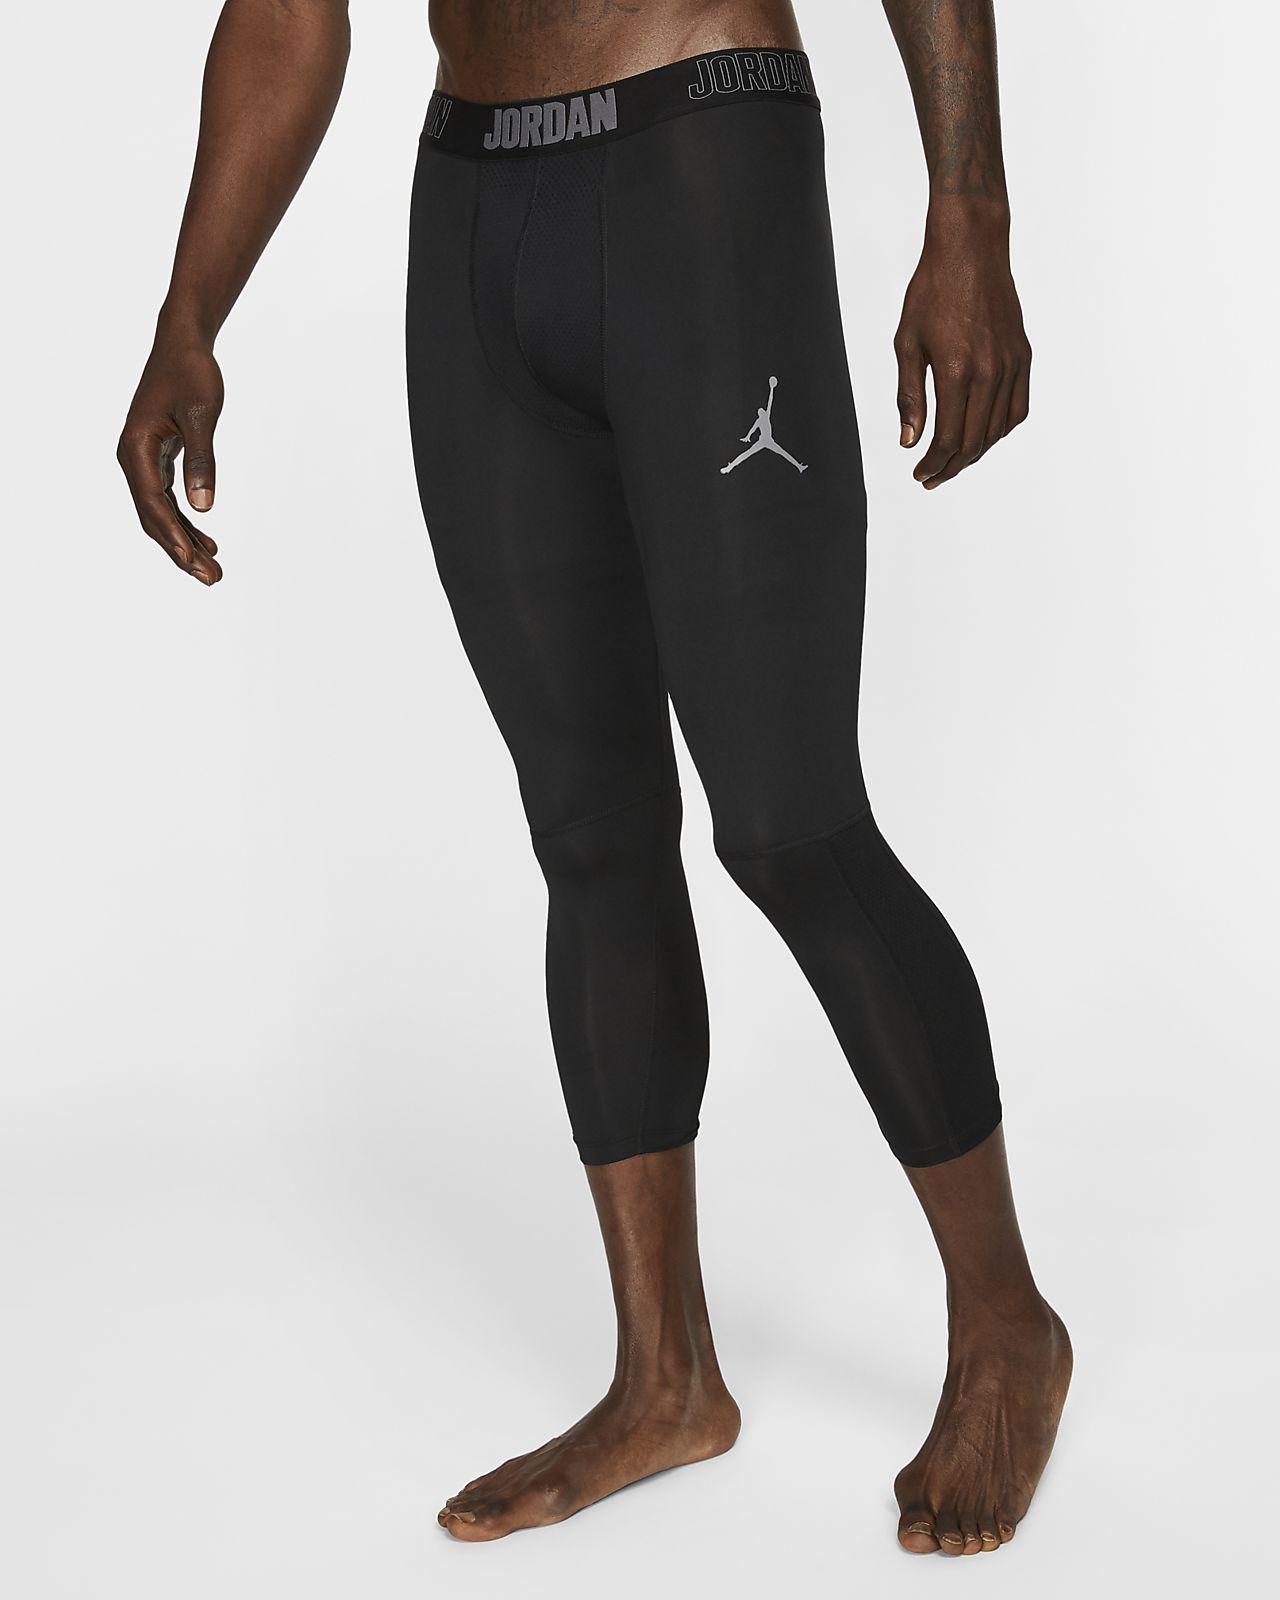 0397308d3baf52 Jordan Dri-FIT 23 Alpha Men s 3 4 Training Tights. Nike.com NZ